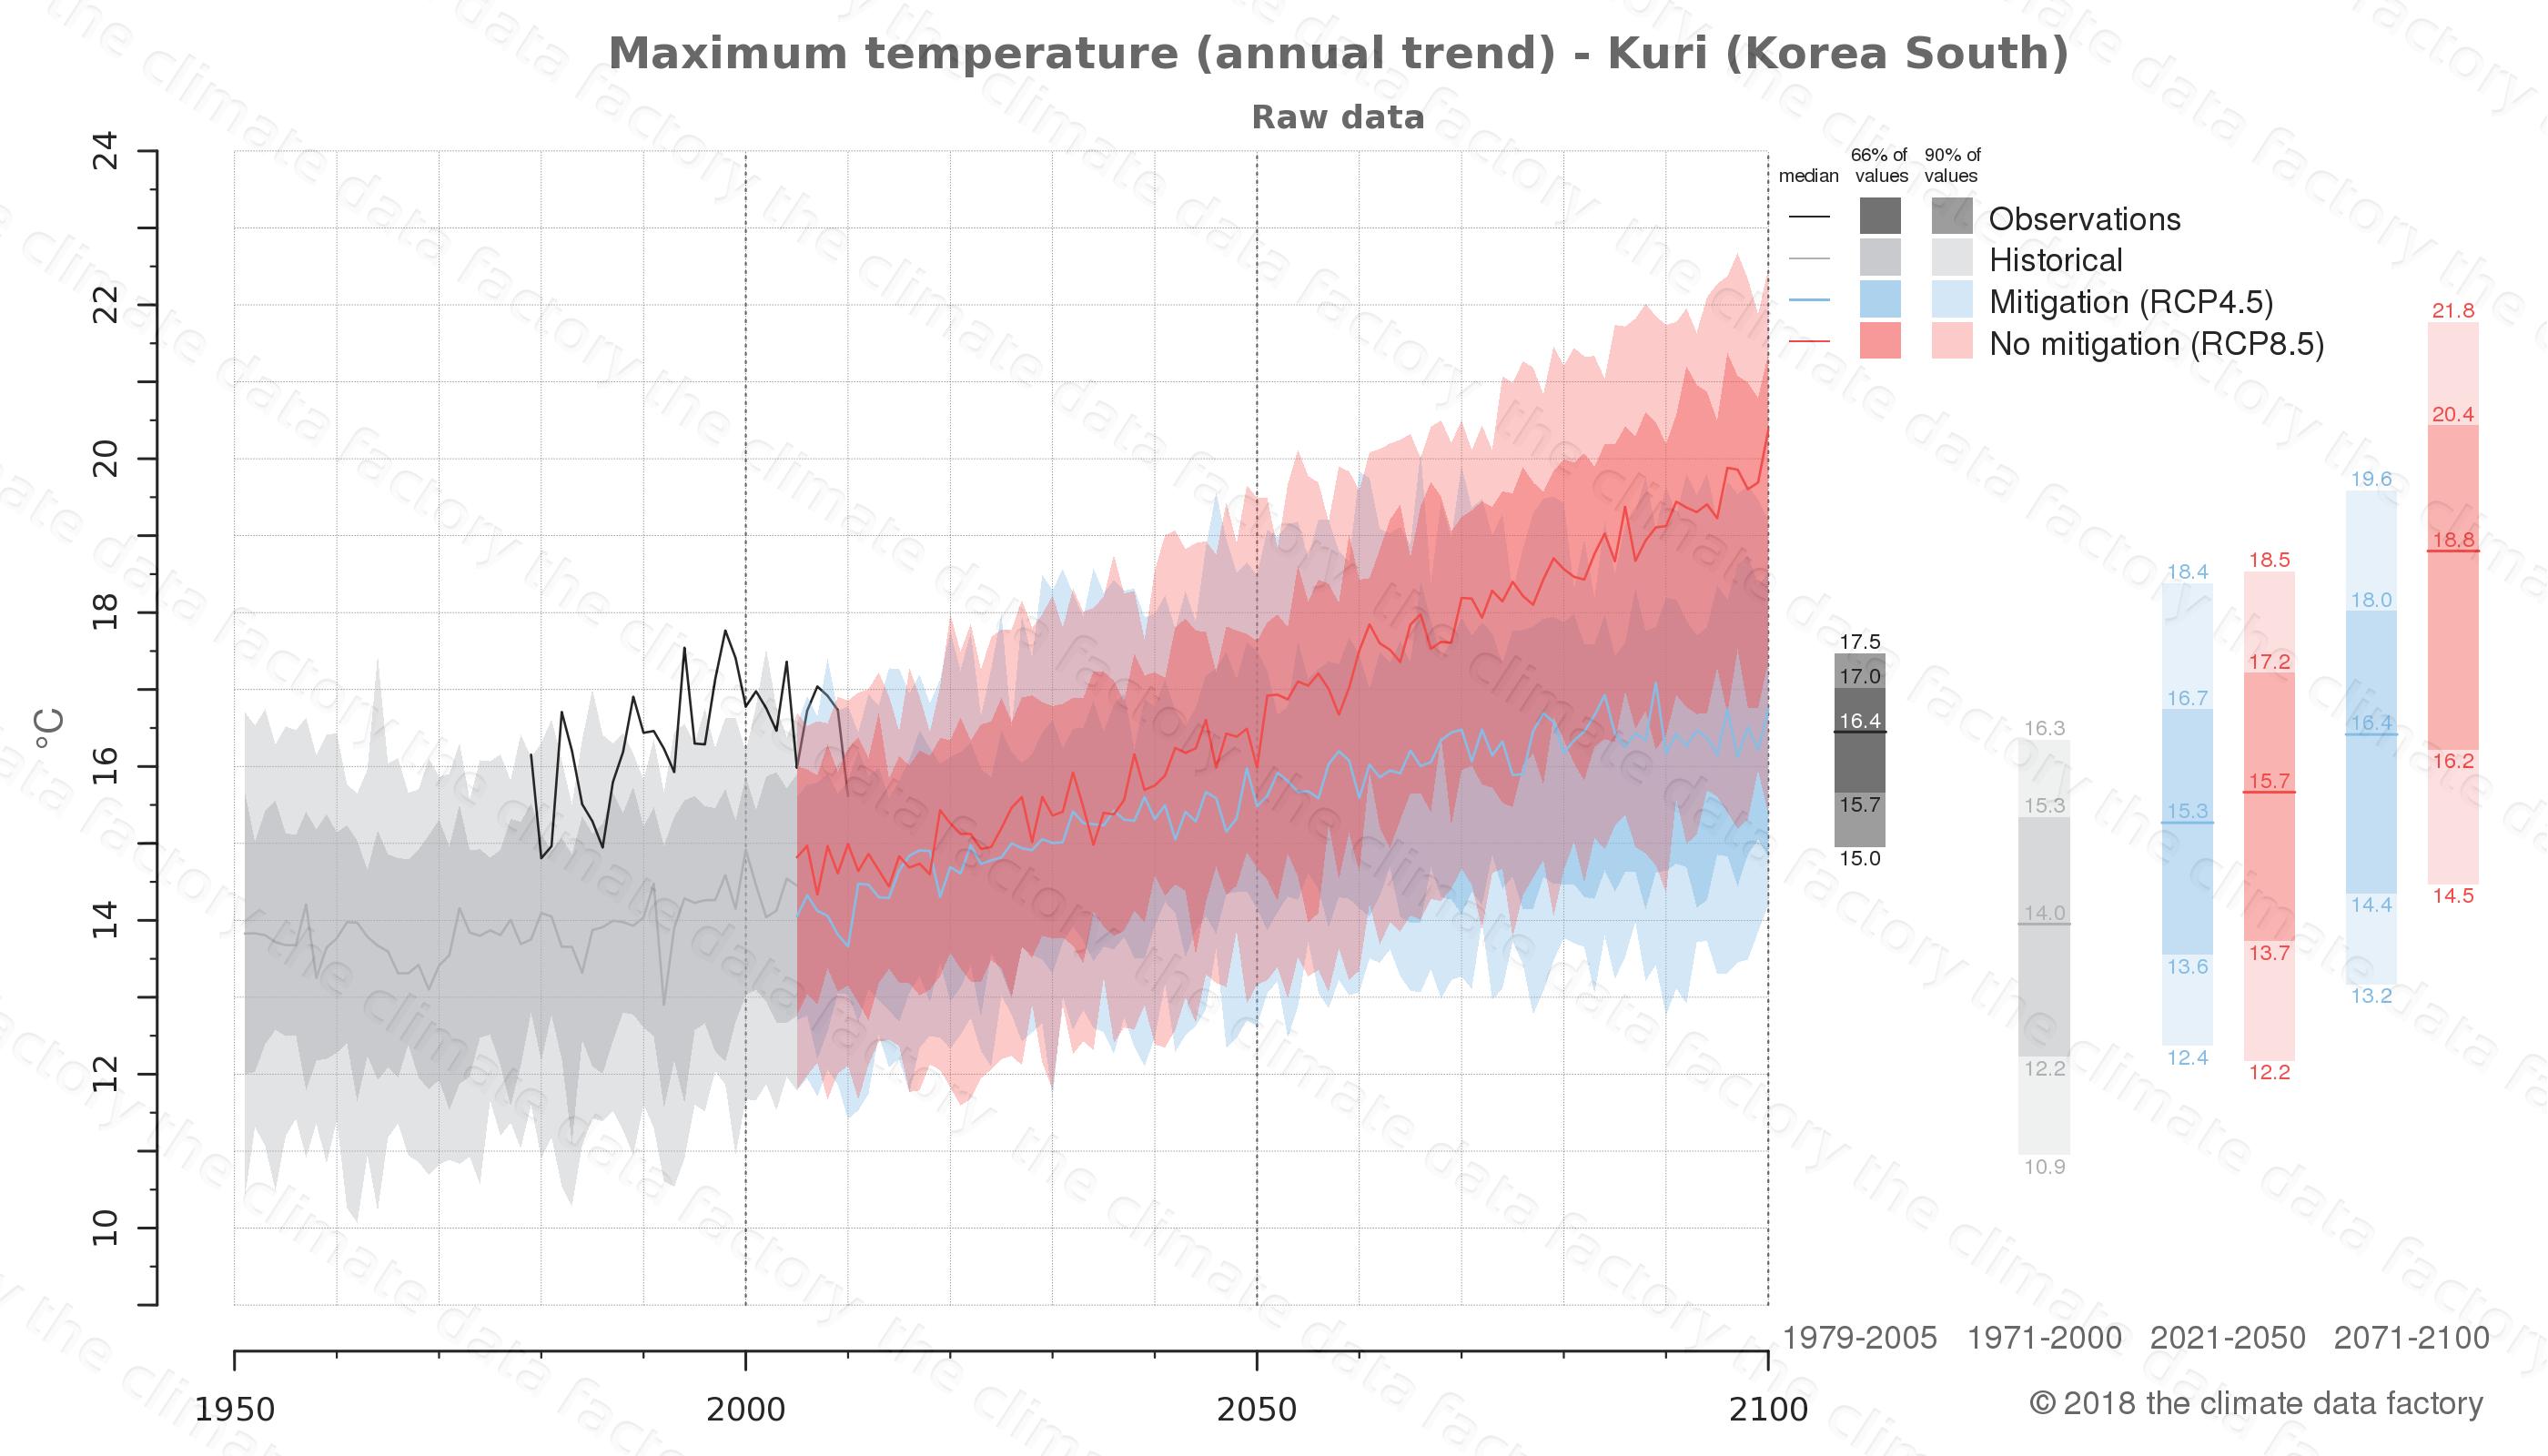 climate change data policy adaptation climate graph city data maximum-temperature kuri south korea